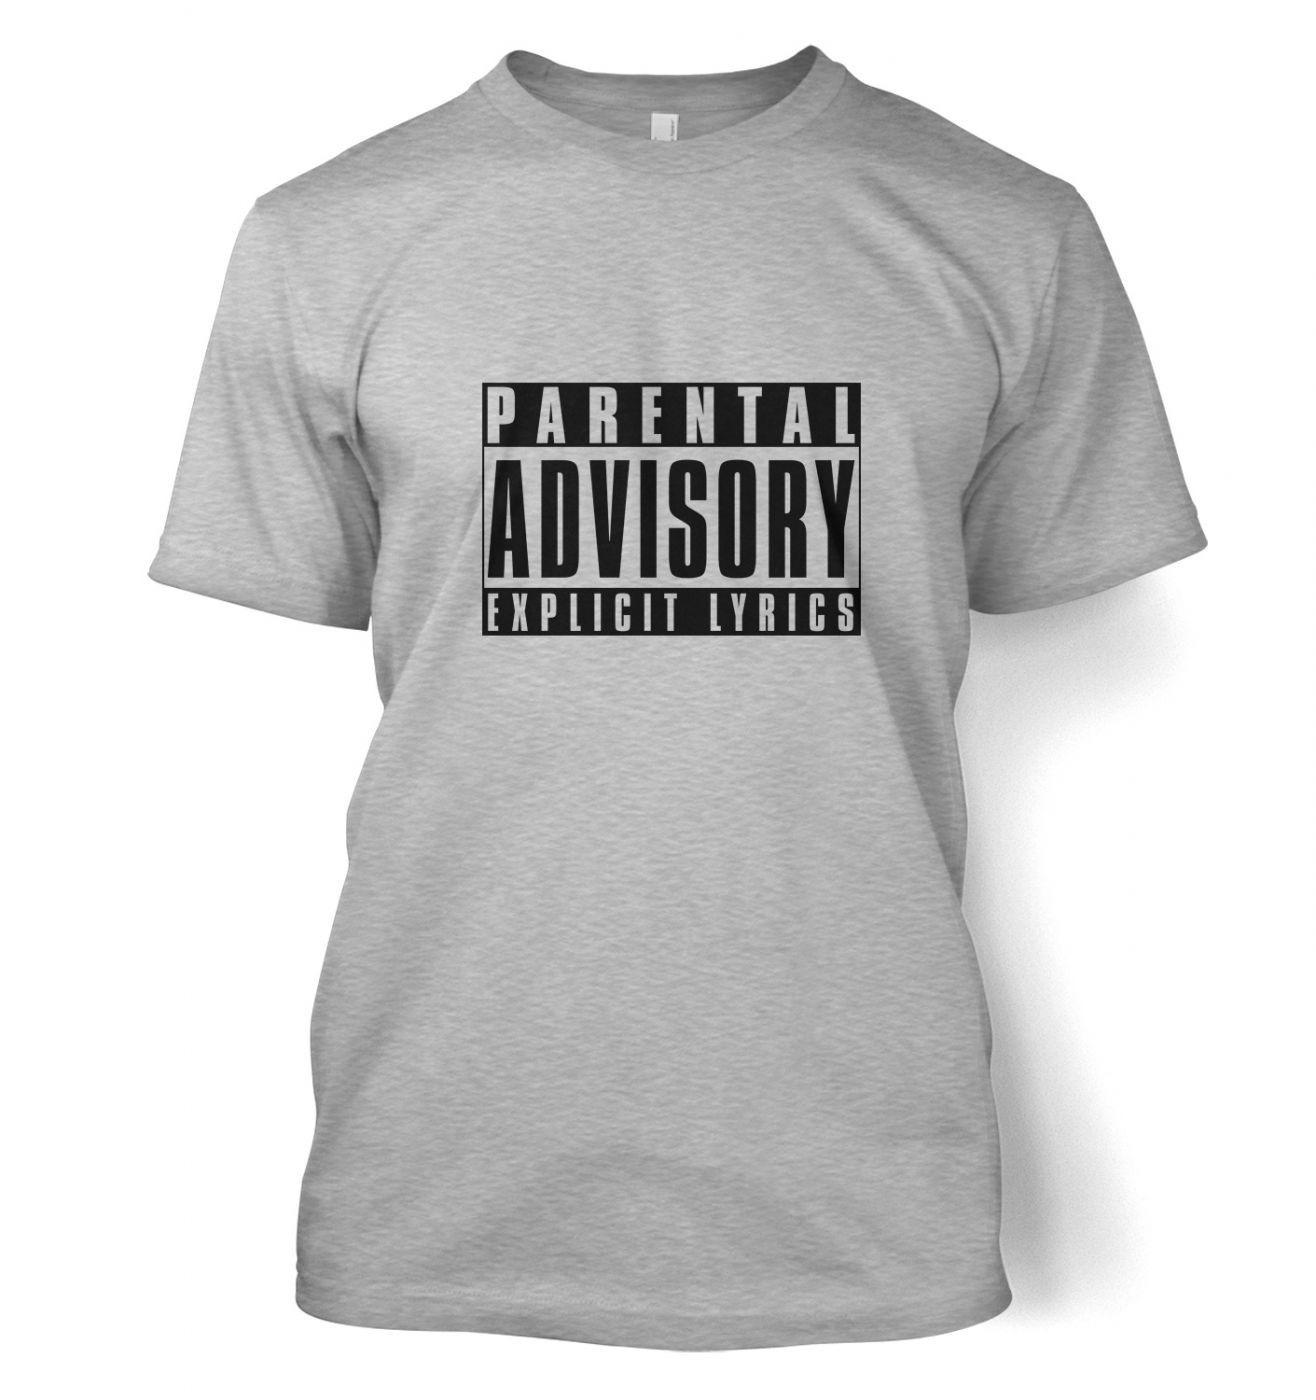 Parental Advisory Explicit Lyrics t-shirt